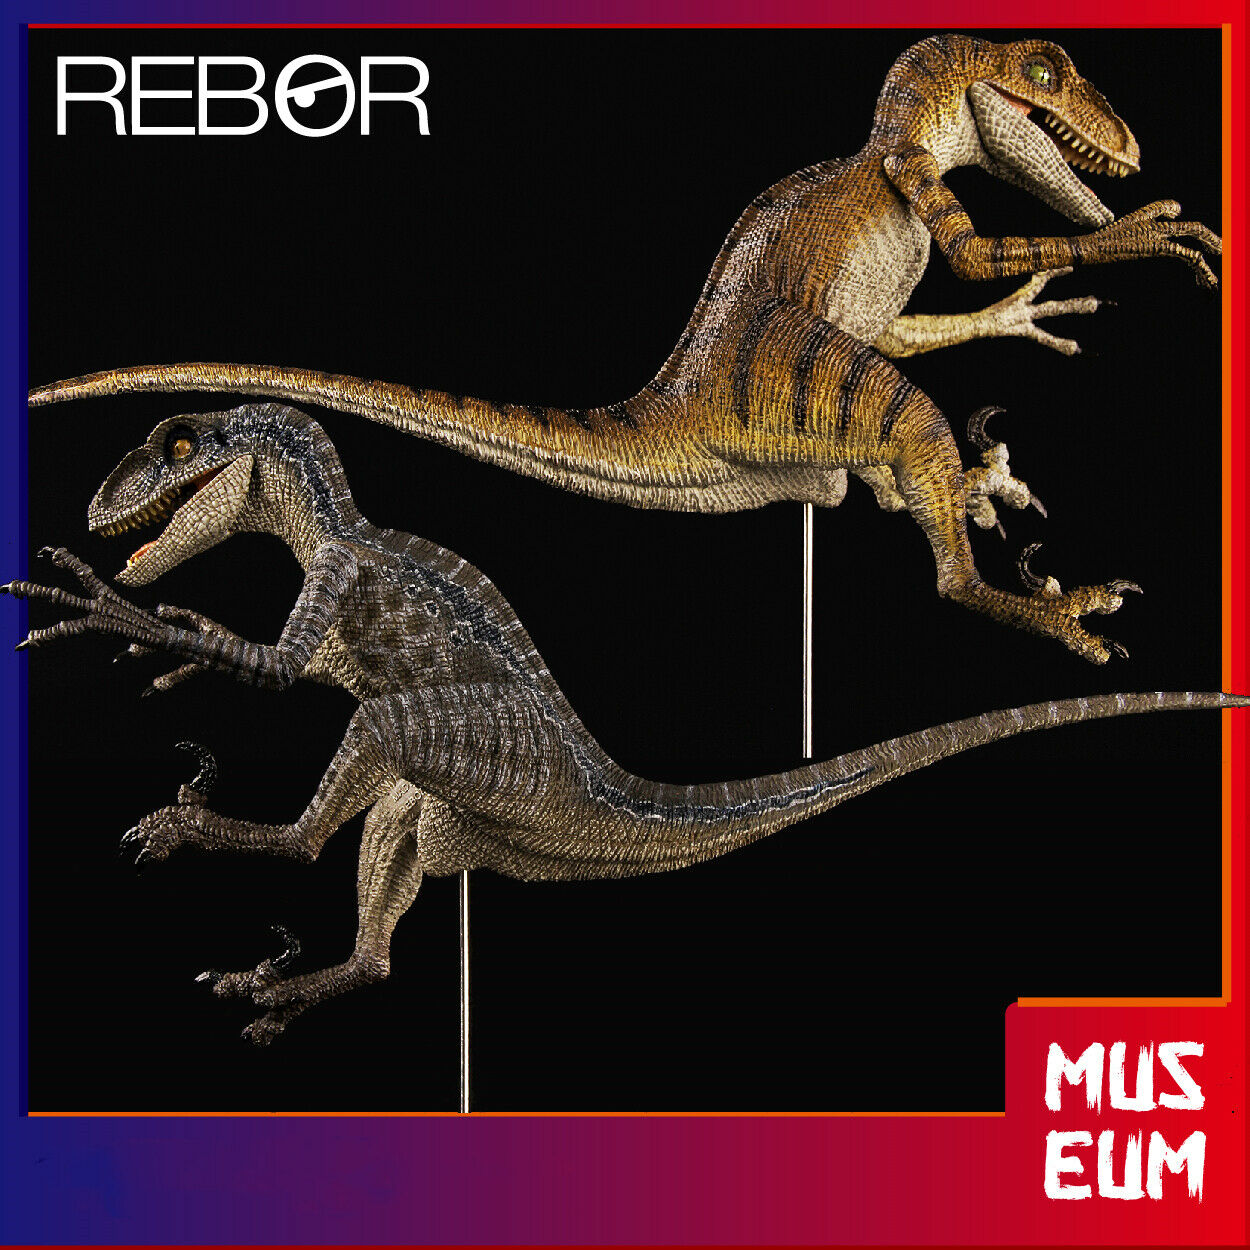 Rebor 1 18 Velociraptor Figure Raptor Dinosaure Modèle Animal Décoration collector toy